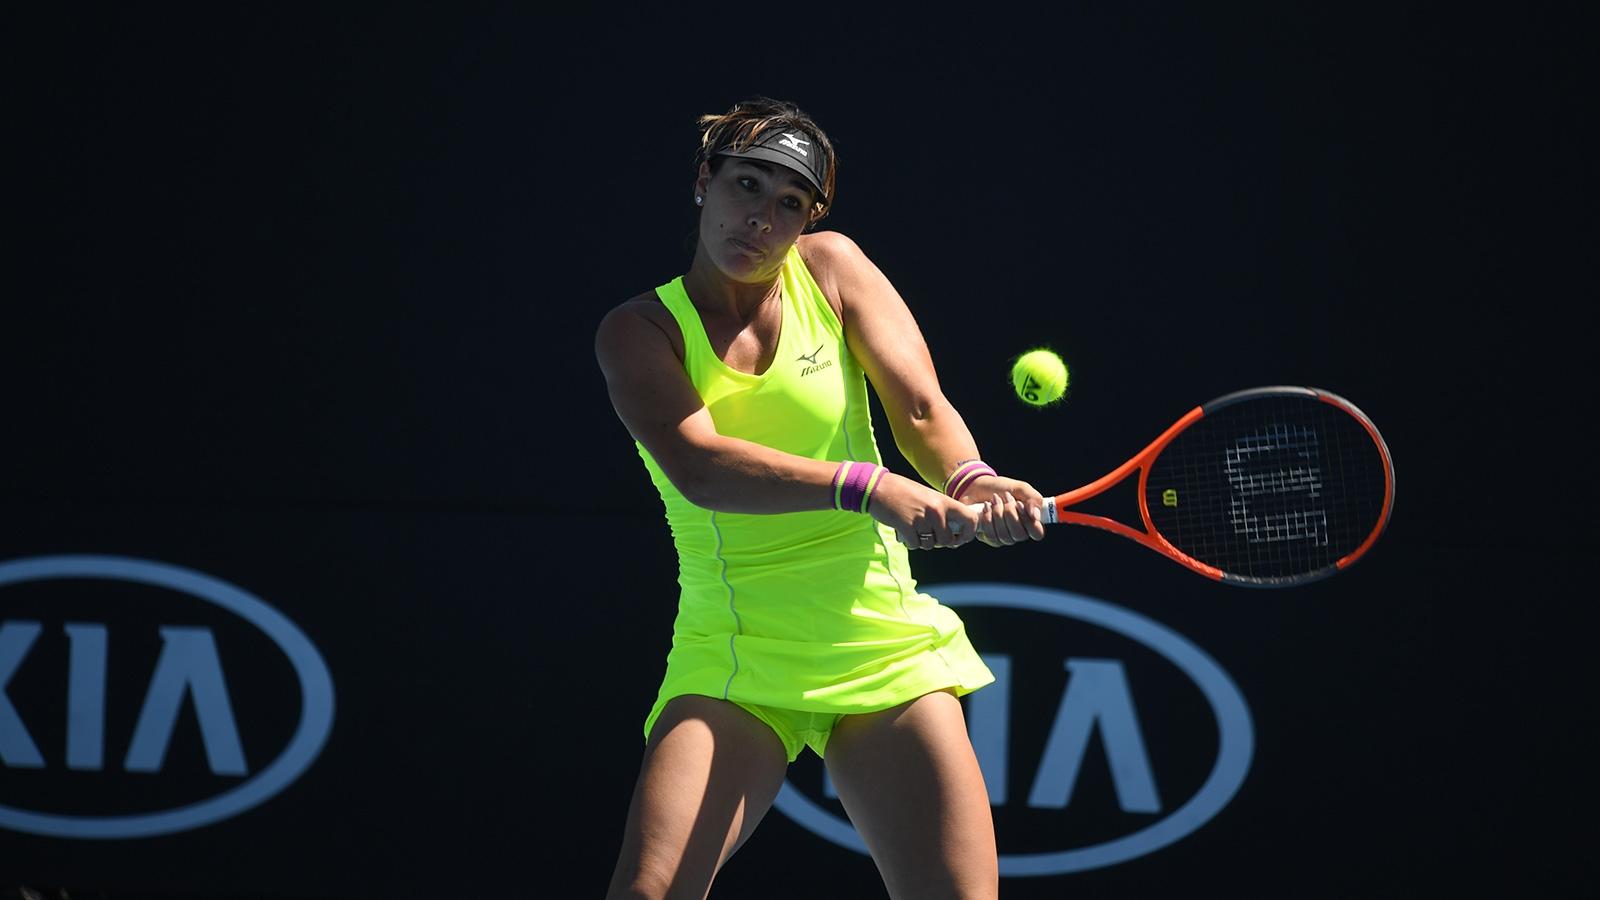 Елица Костова се класира за полуфиналите на турнира по тенис